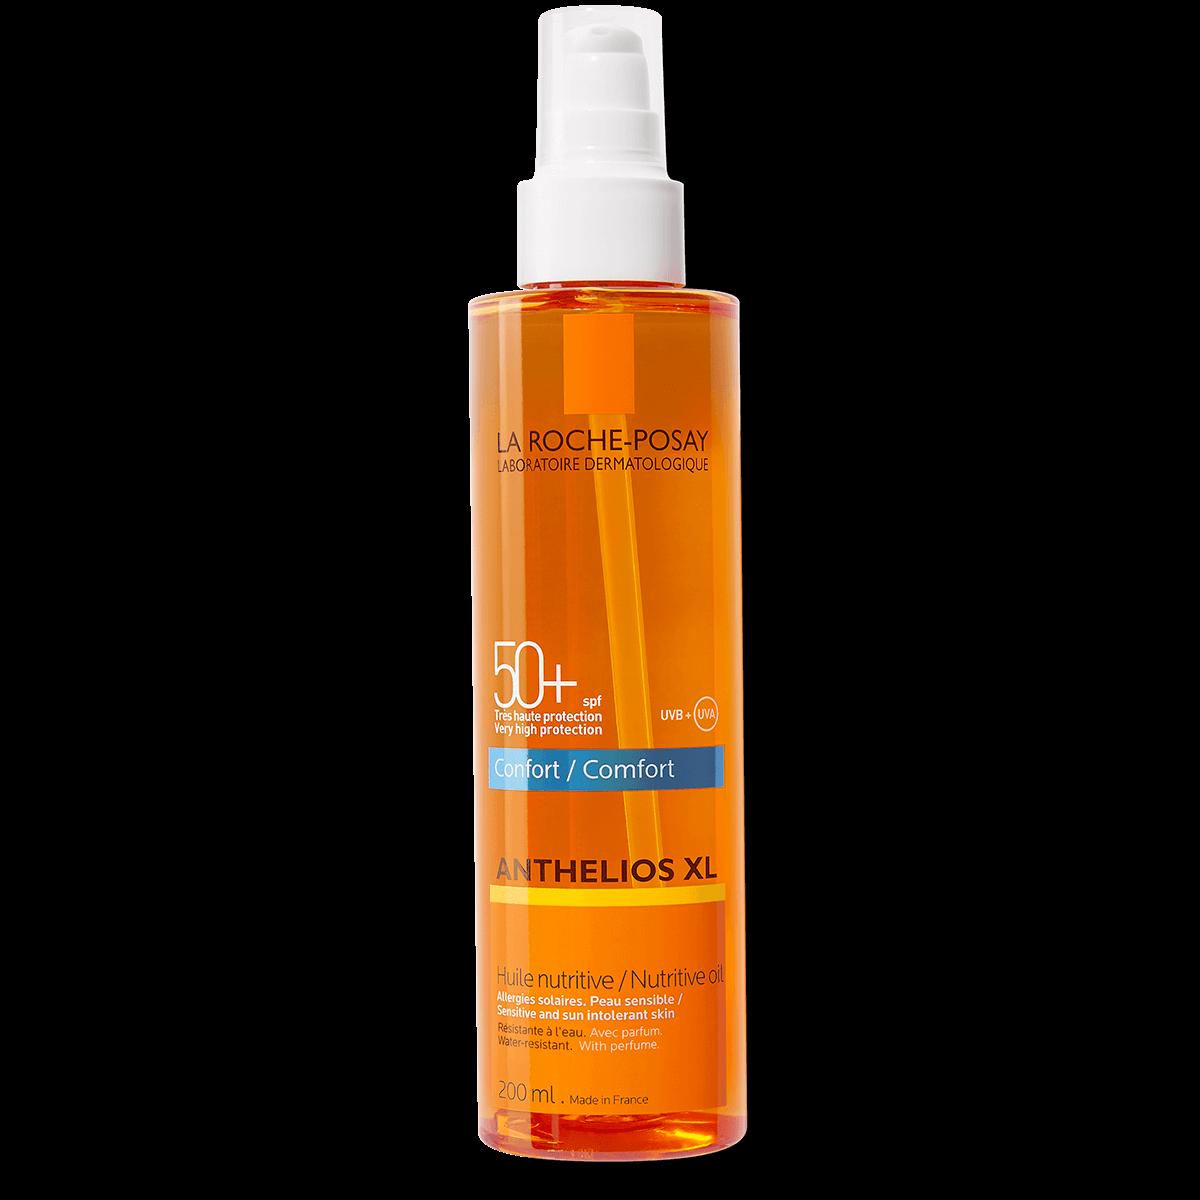 La Roche Posay ProductPage Sun Anthelios XL Nutritive Oil Comfort Spf5